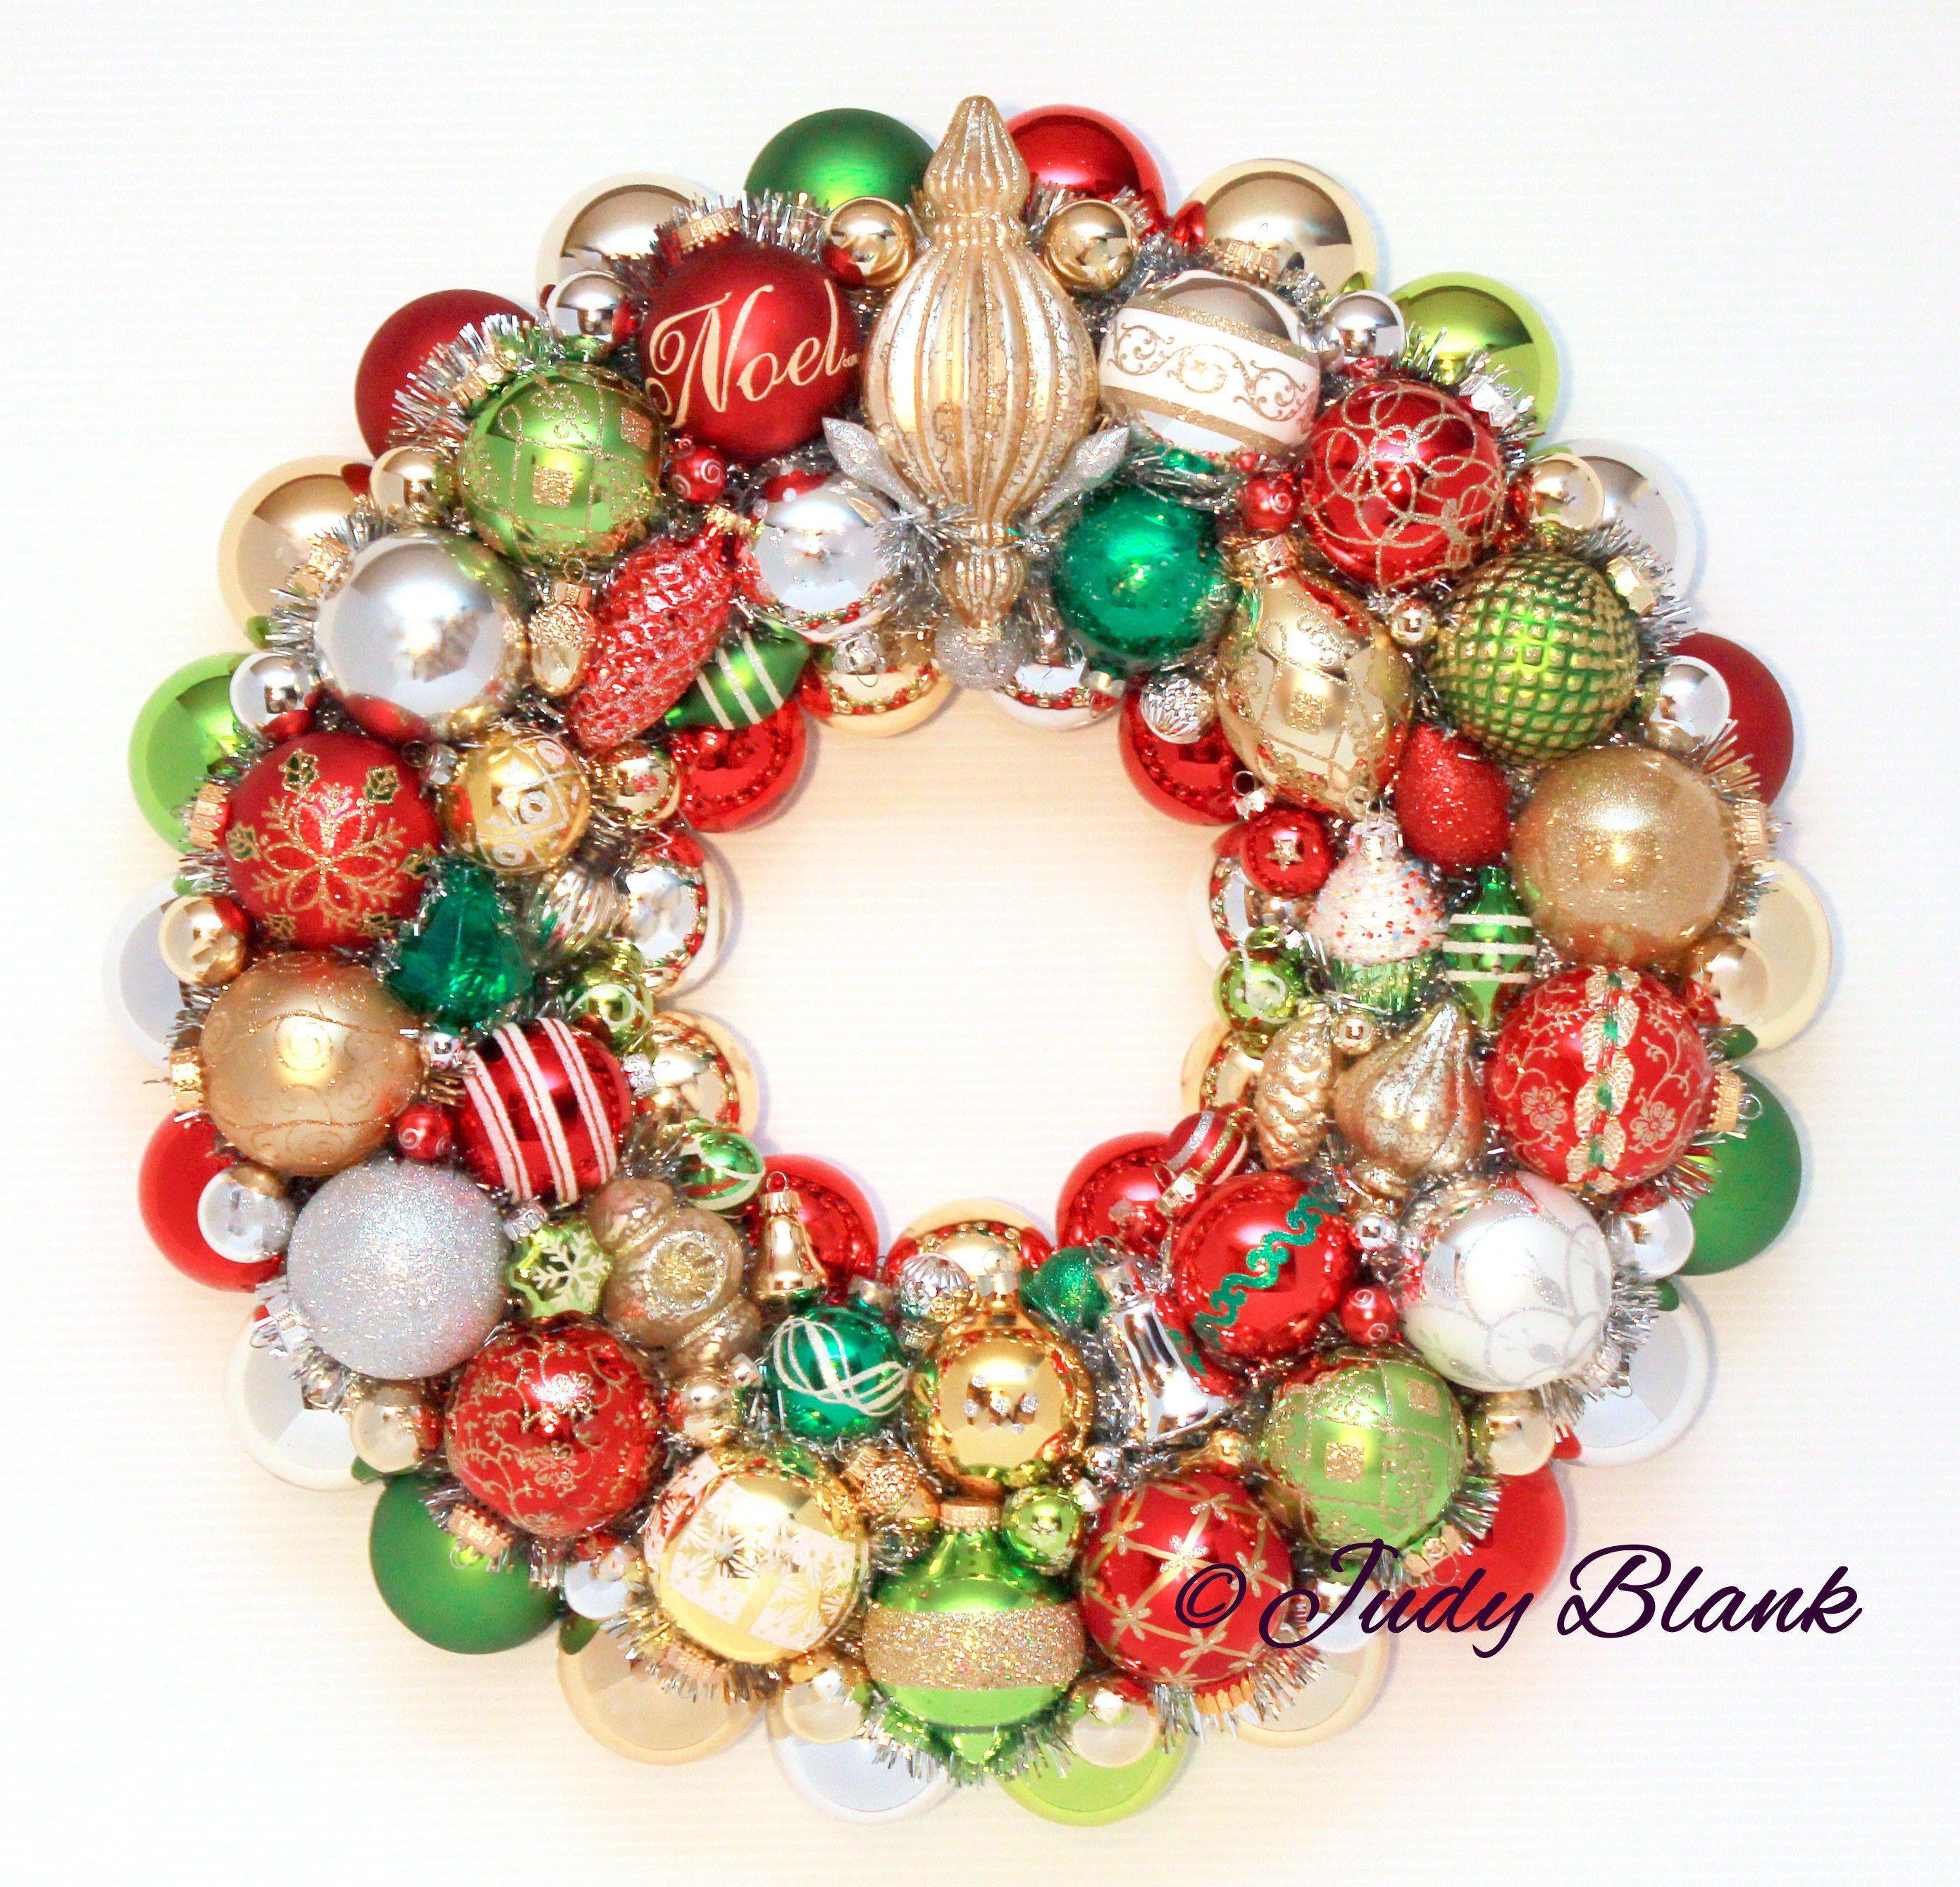 Christmas Ornament Wreath Ball Weath Vintage Ornament Wreath Noel Wreath Vintage Ornament Wreath Christmas Ornament Wreath Vintage Ornaments